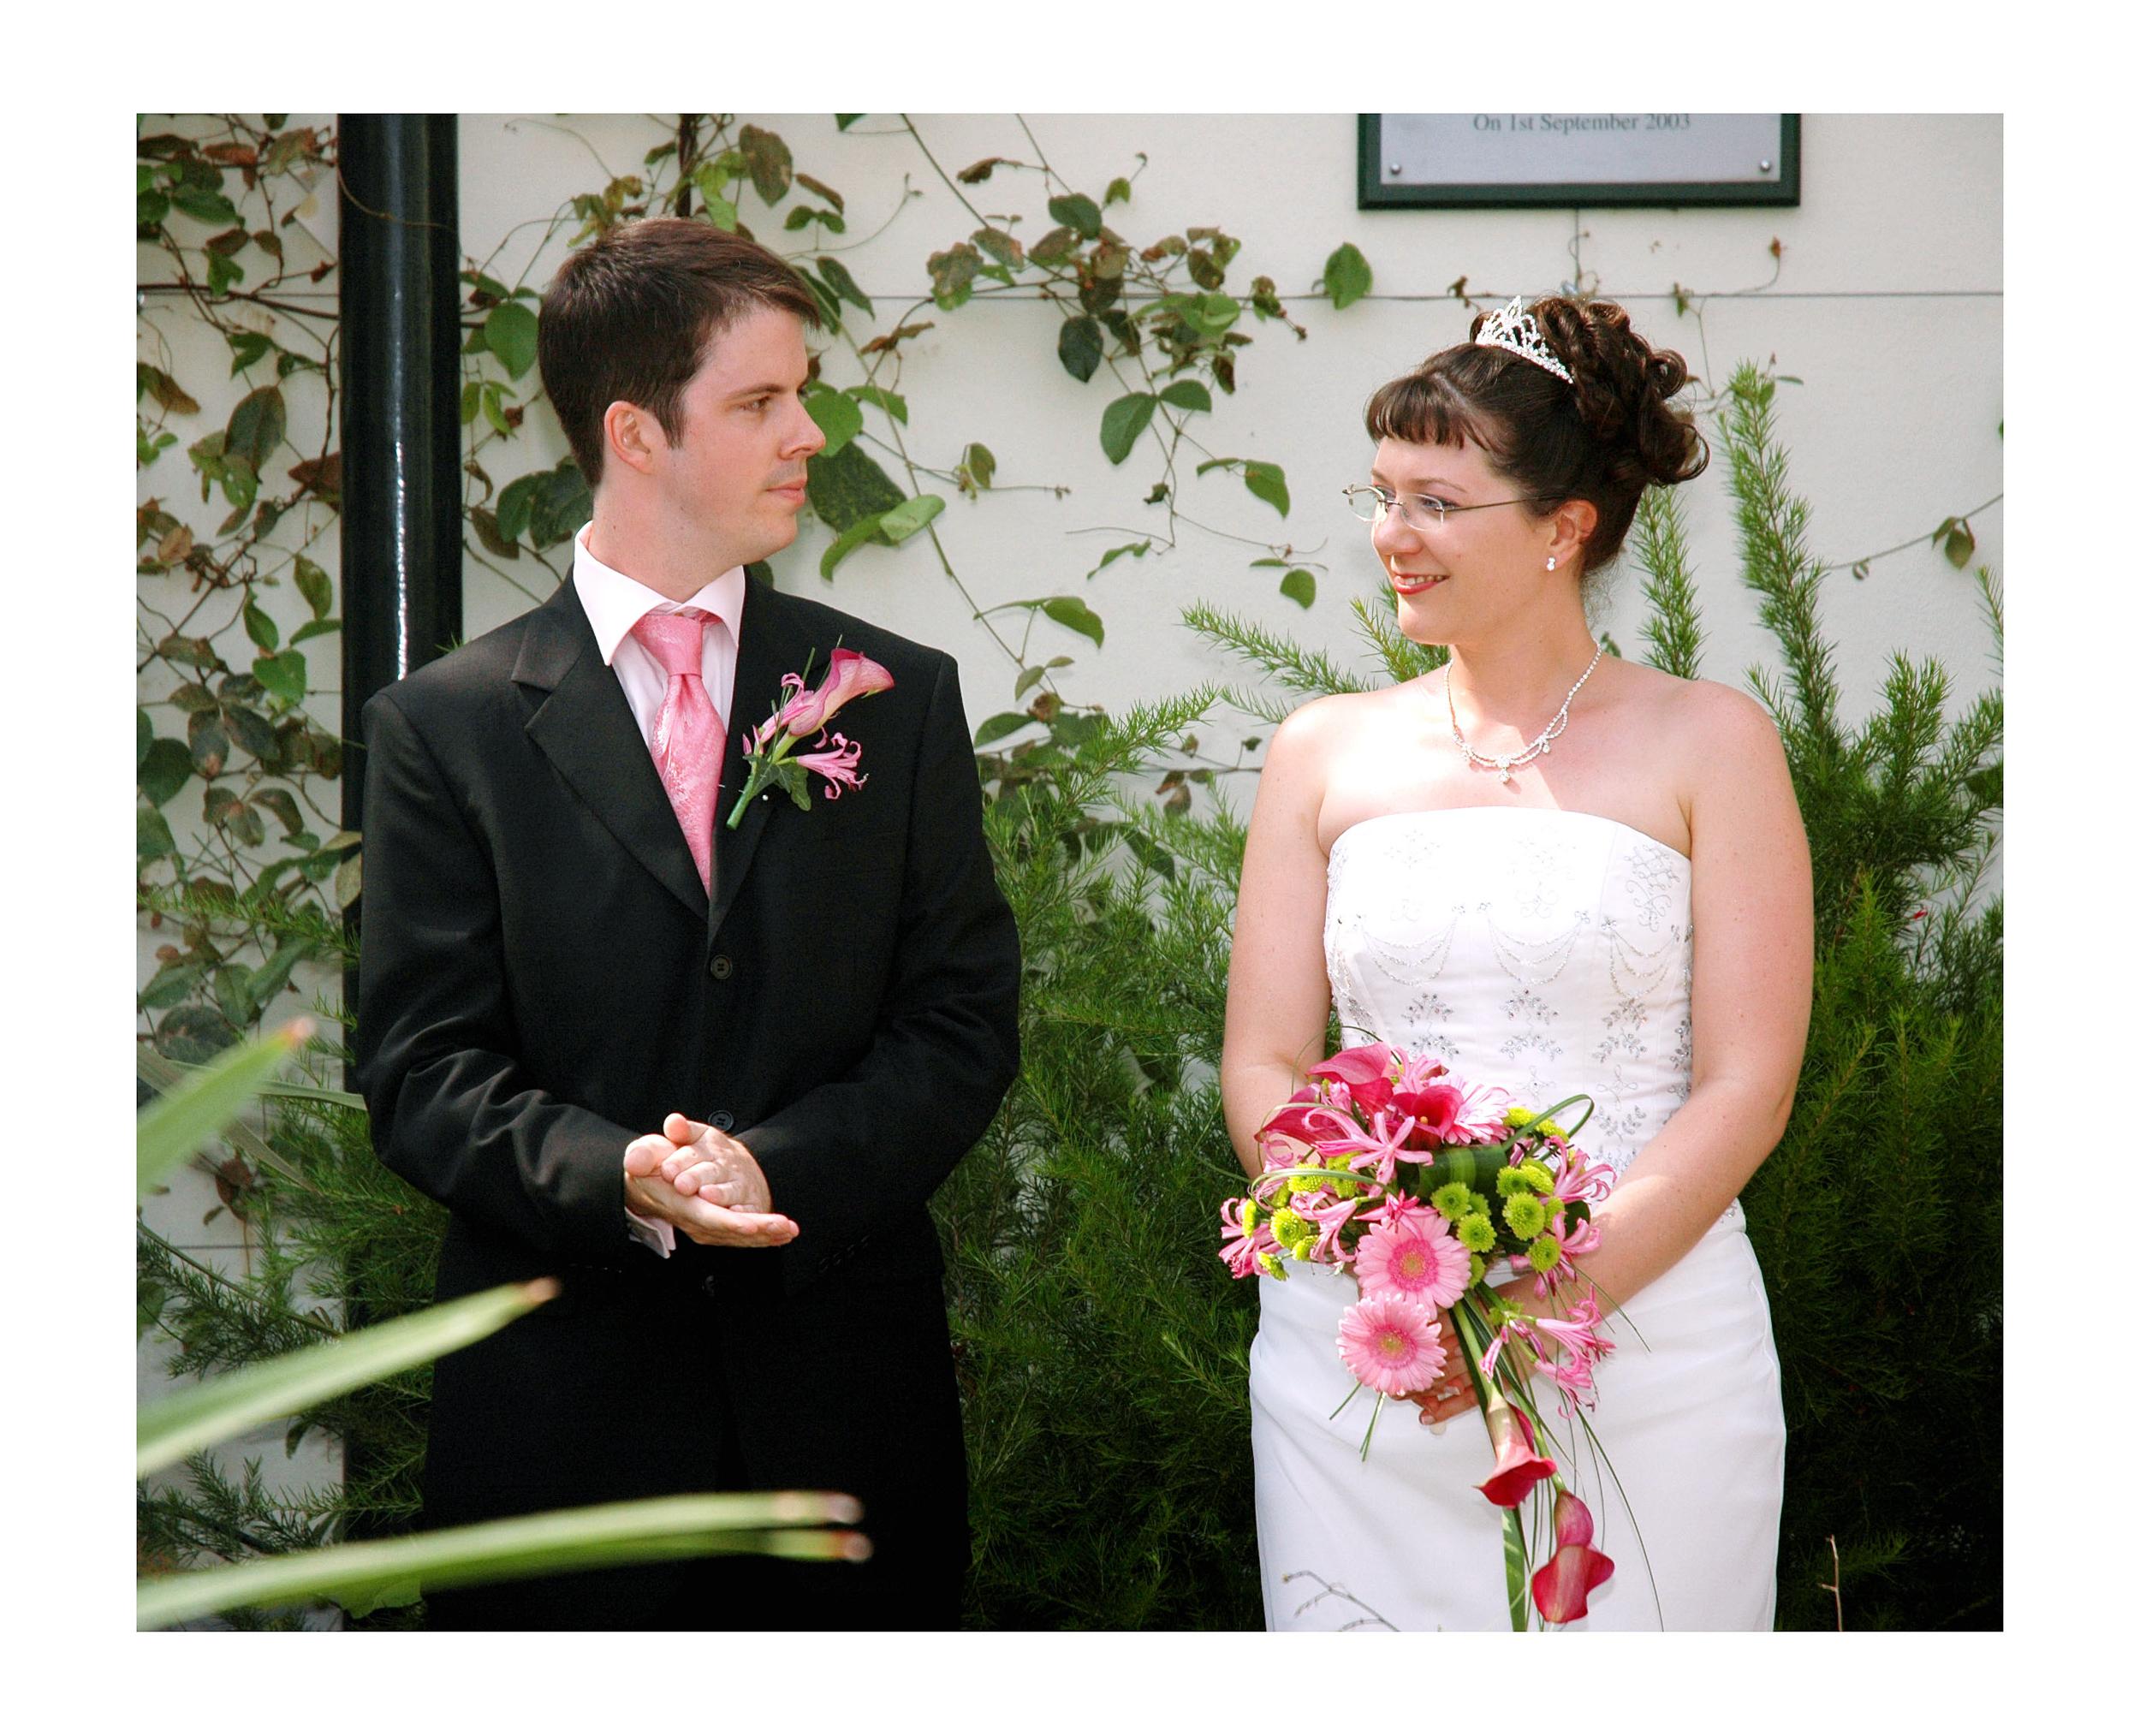 REPORTAGE-WEDDING-PHOTOGRAPHY-SET-UK-11.jpg